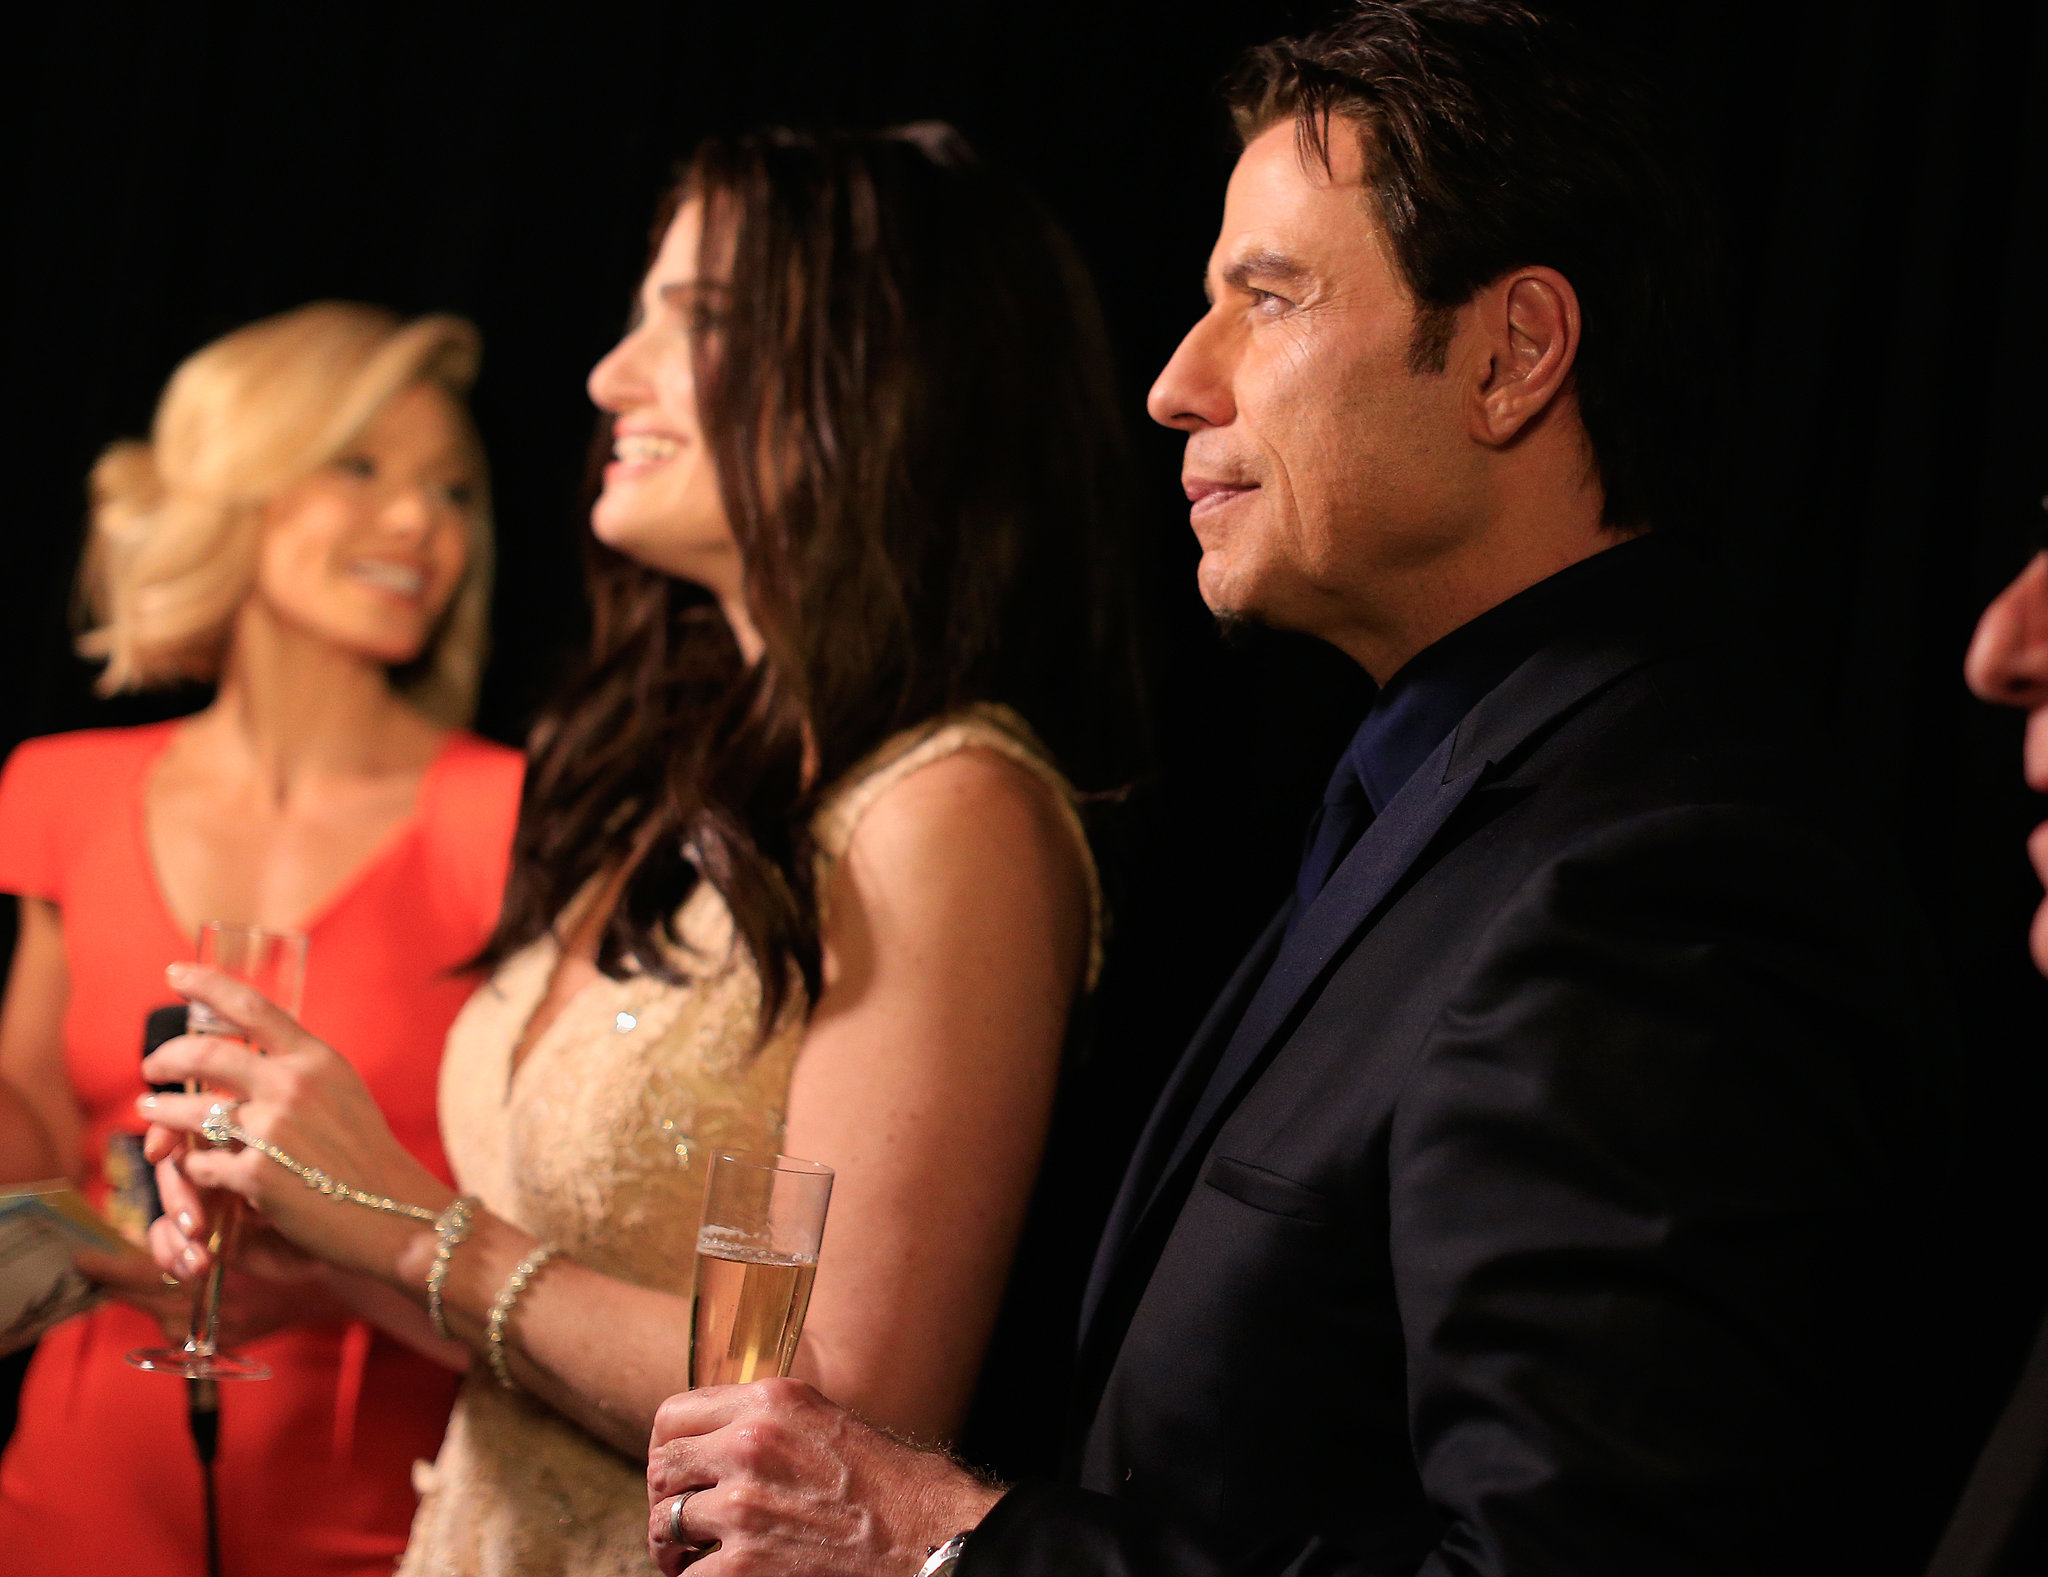 John Travolta and Idina Menzel sipped some bubbly backstage.